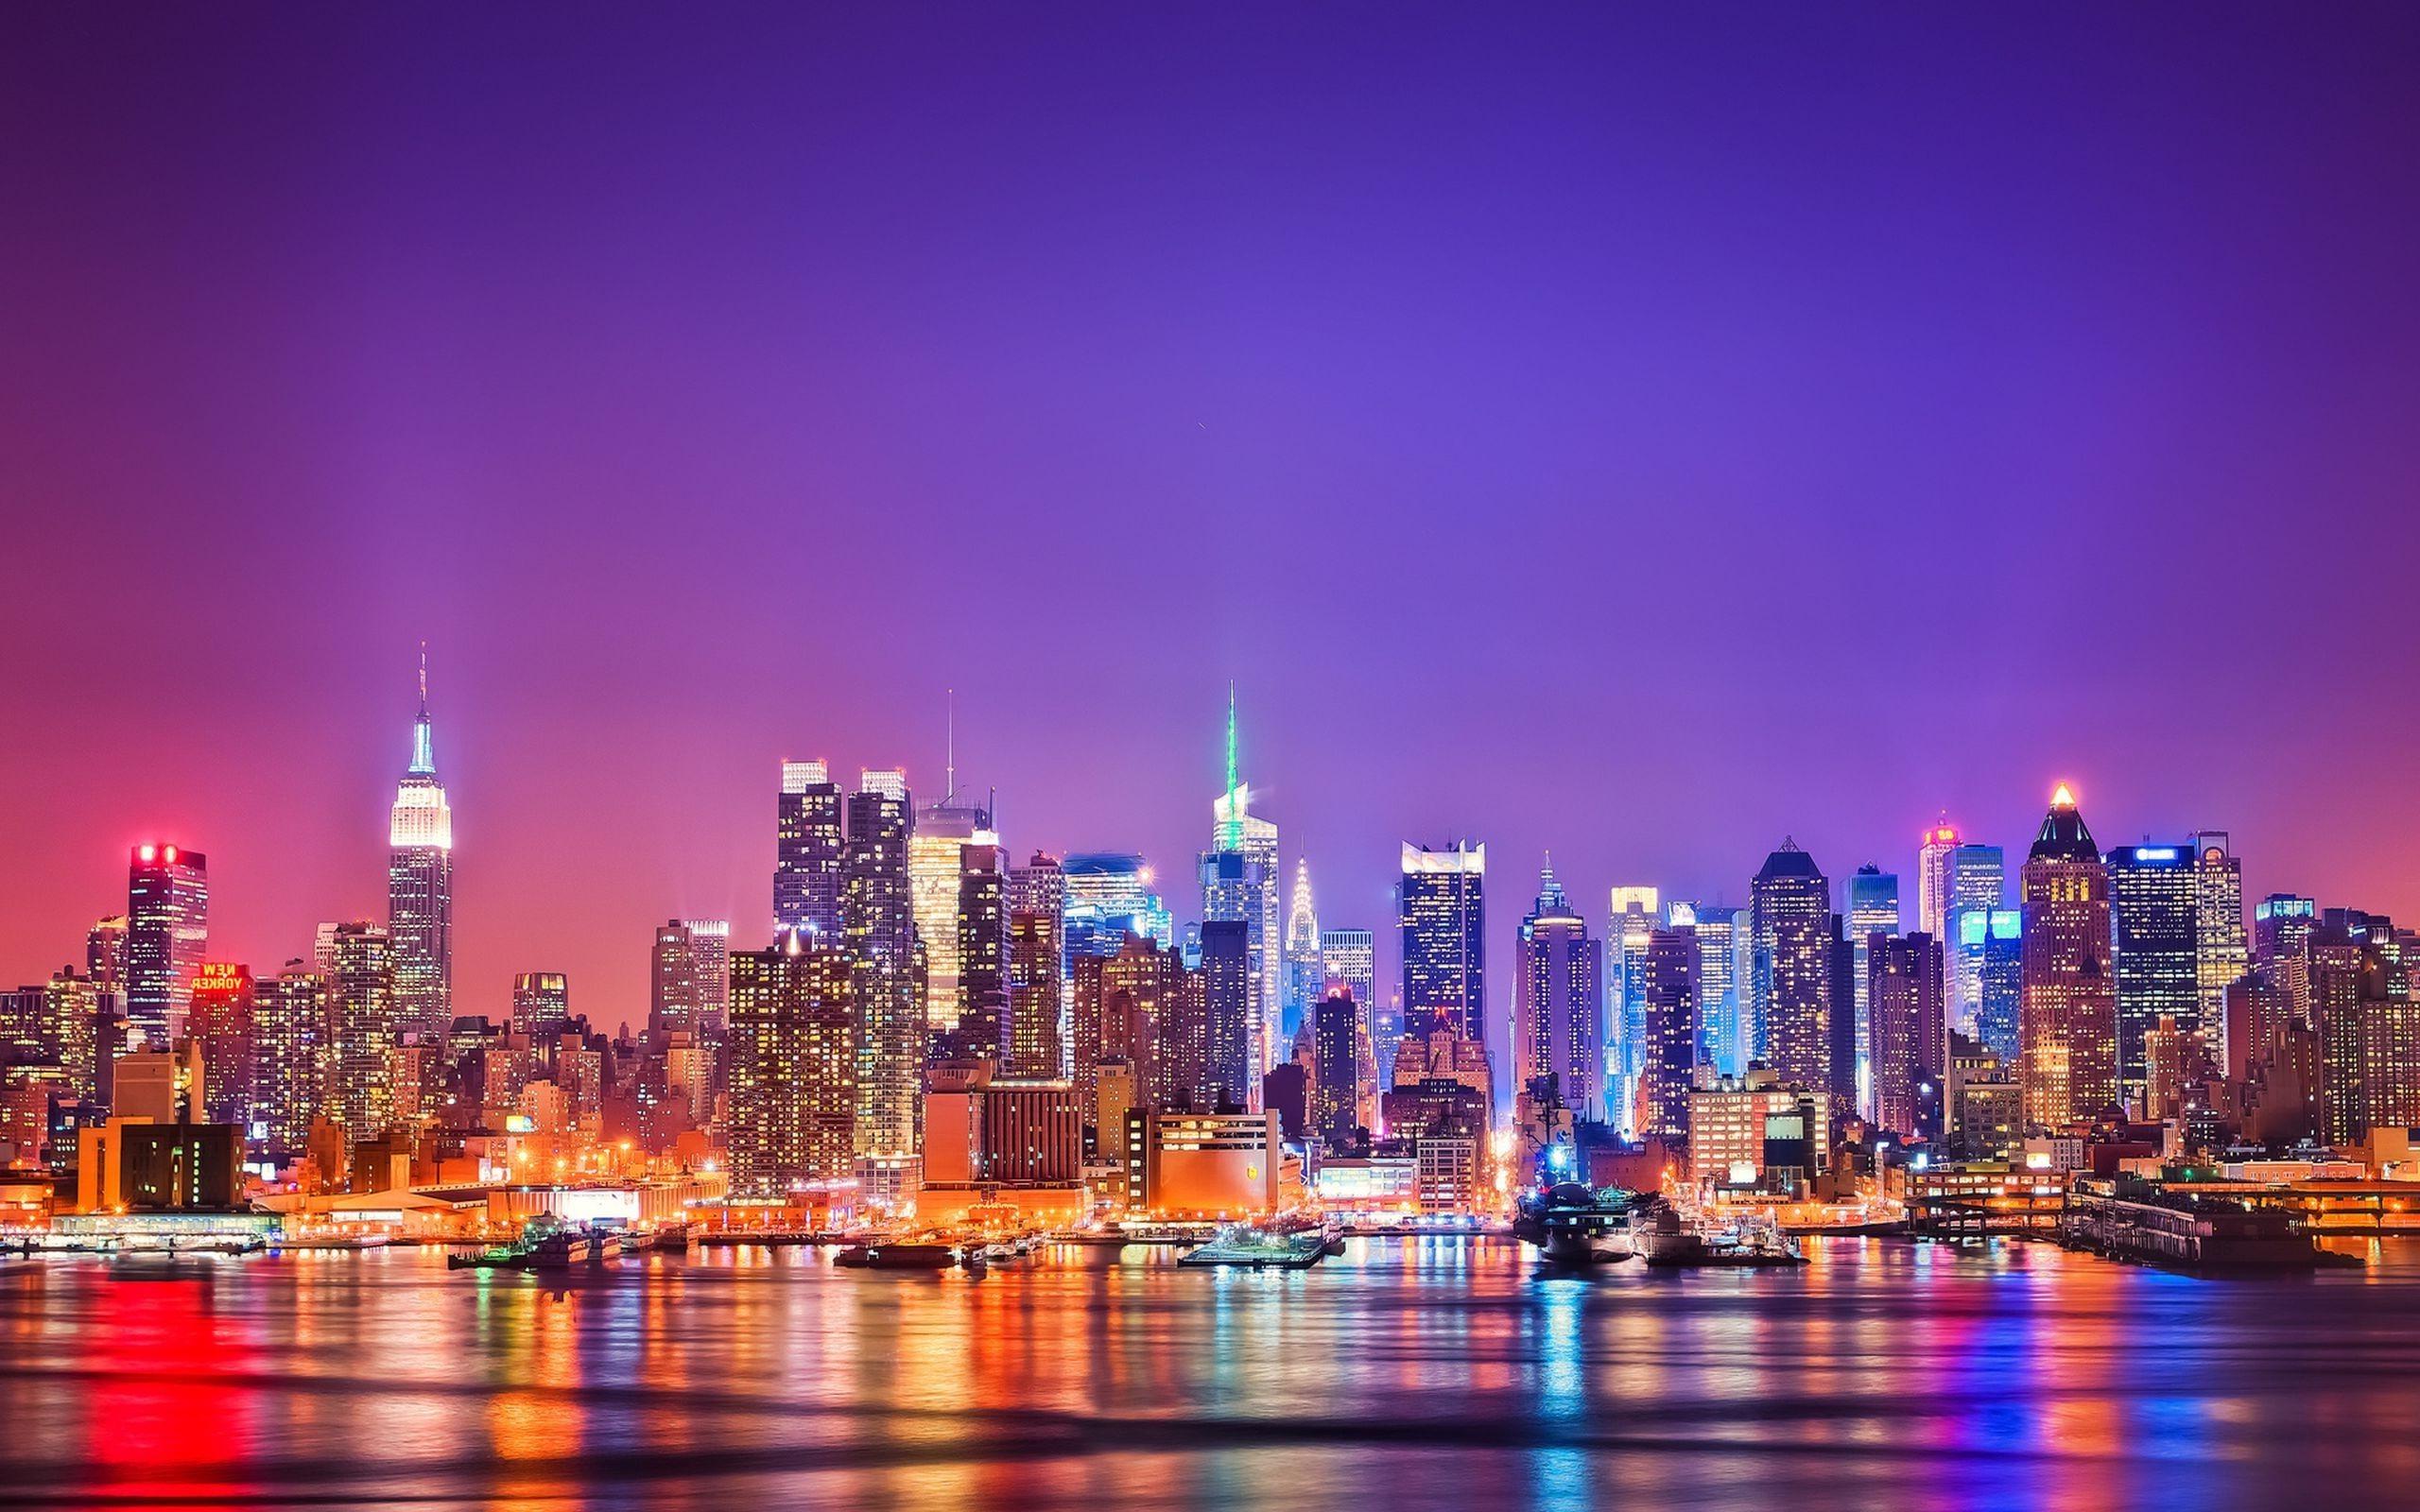 Beautiful New York City Light At Night Wallpaper 7677 Frenziacom 2560x1600